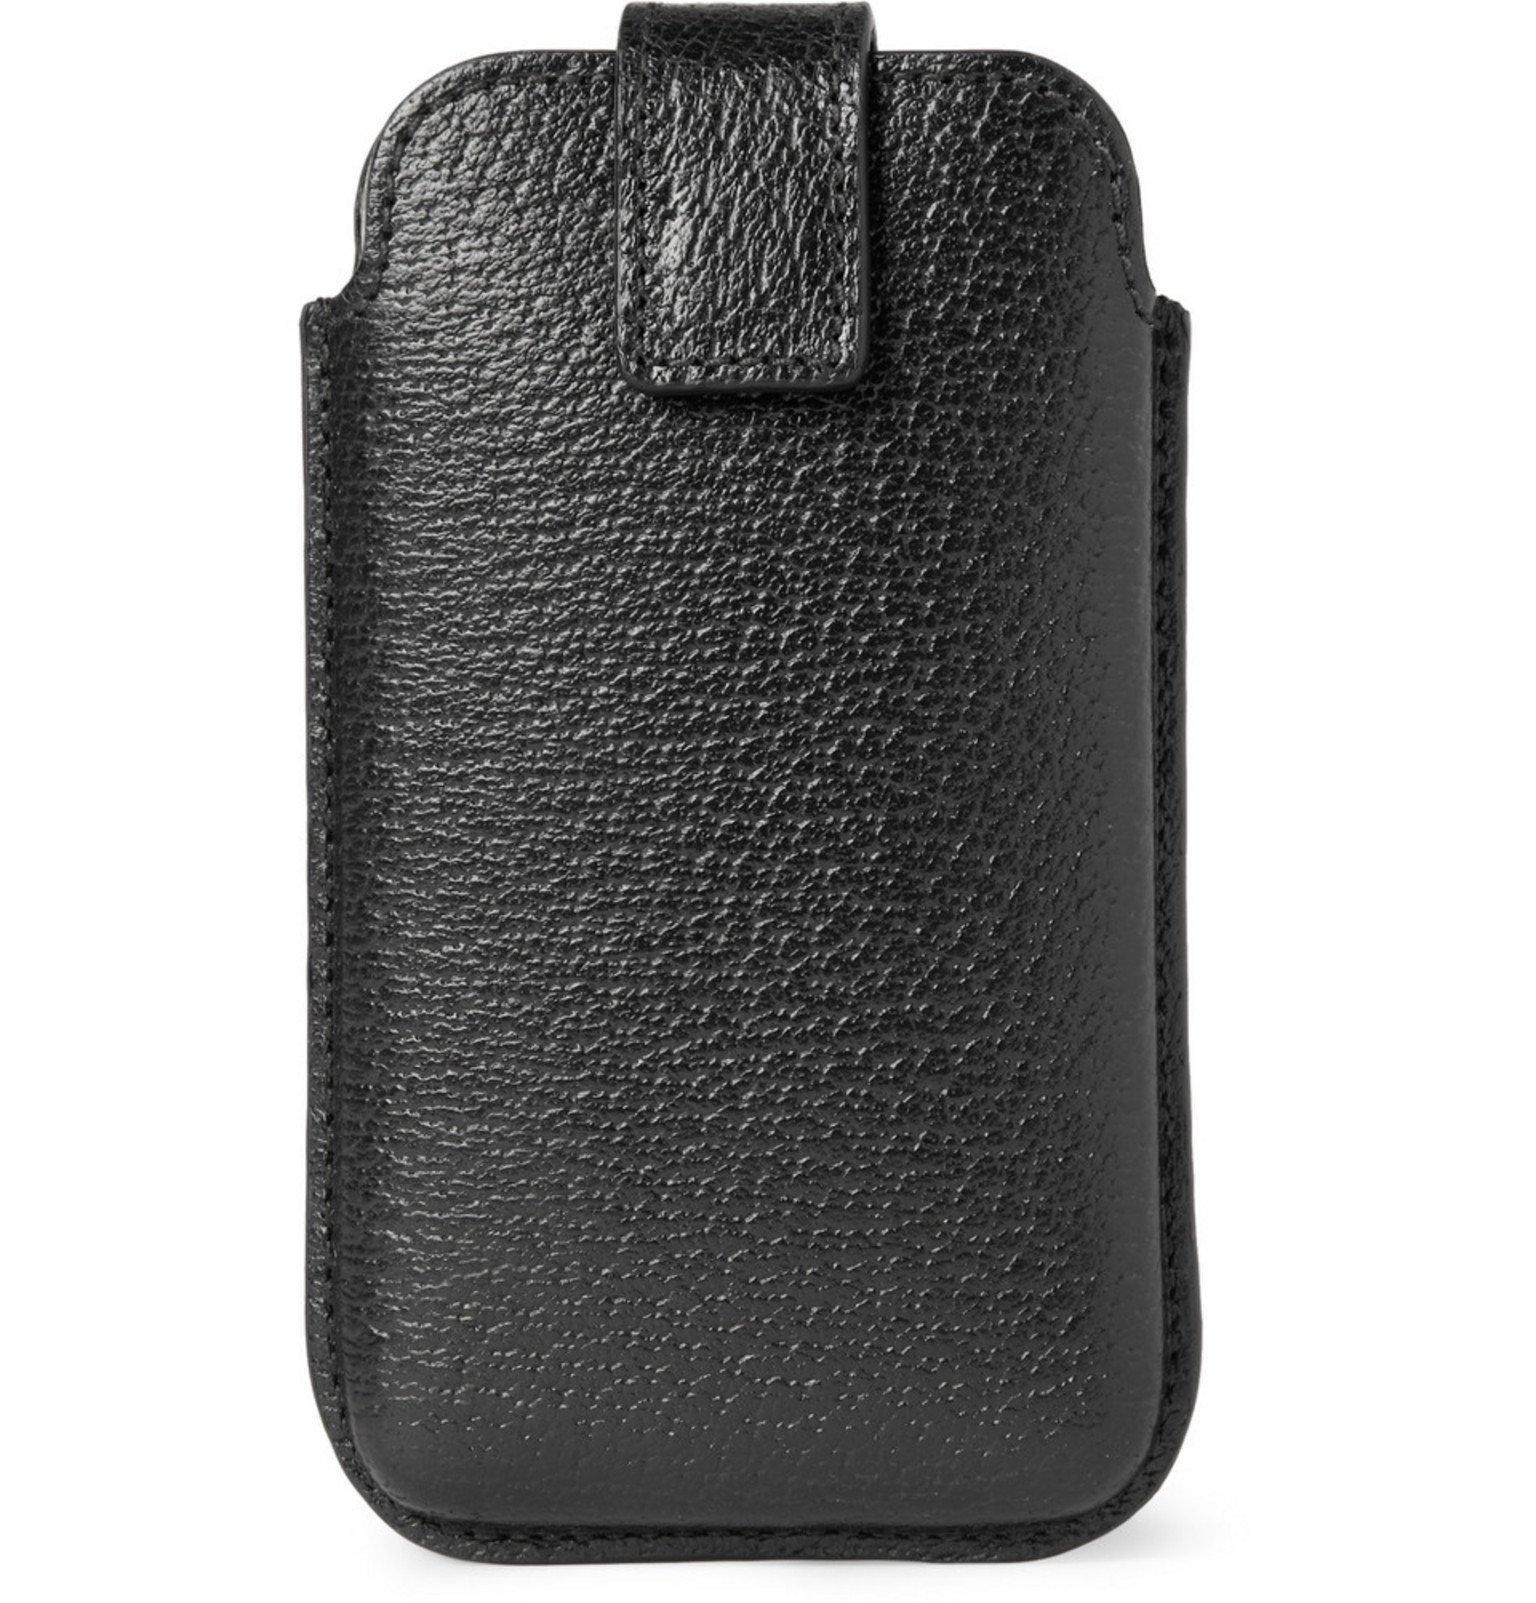 Smythson - Leather Smartphone Case - Black